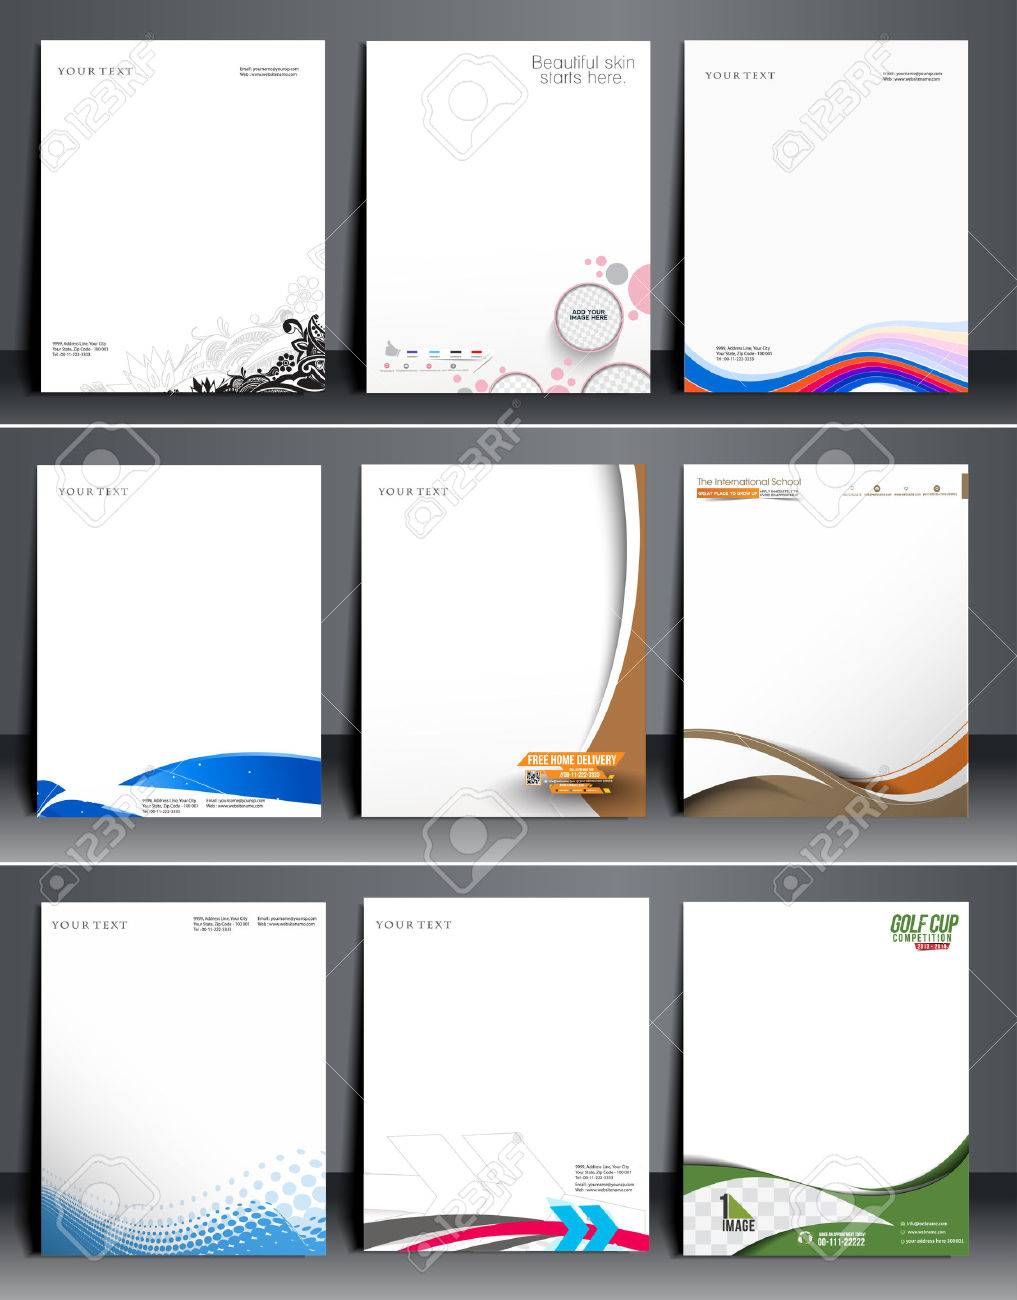 Business Style Corporate Identity Leterhead Template. Stock Vector - 41833146